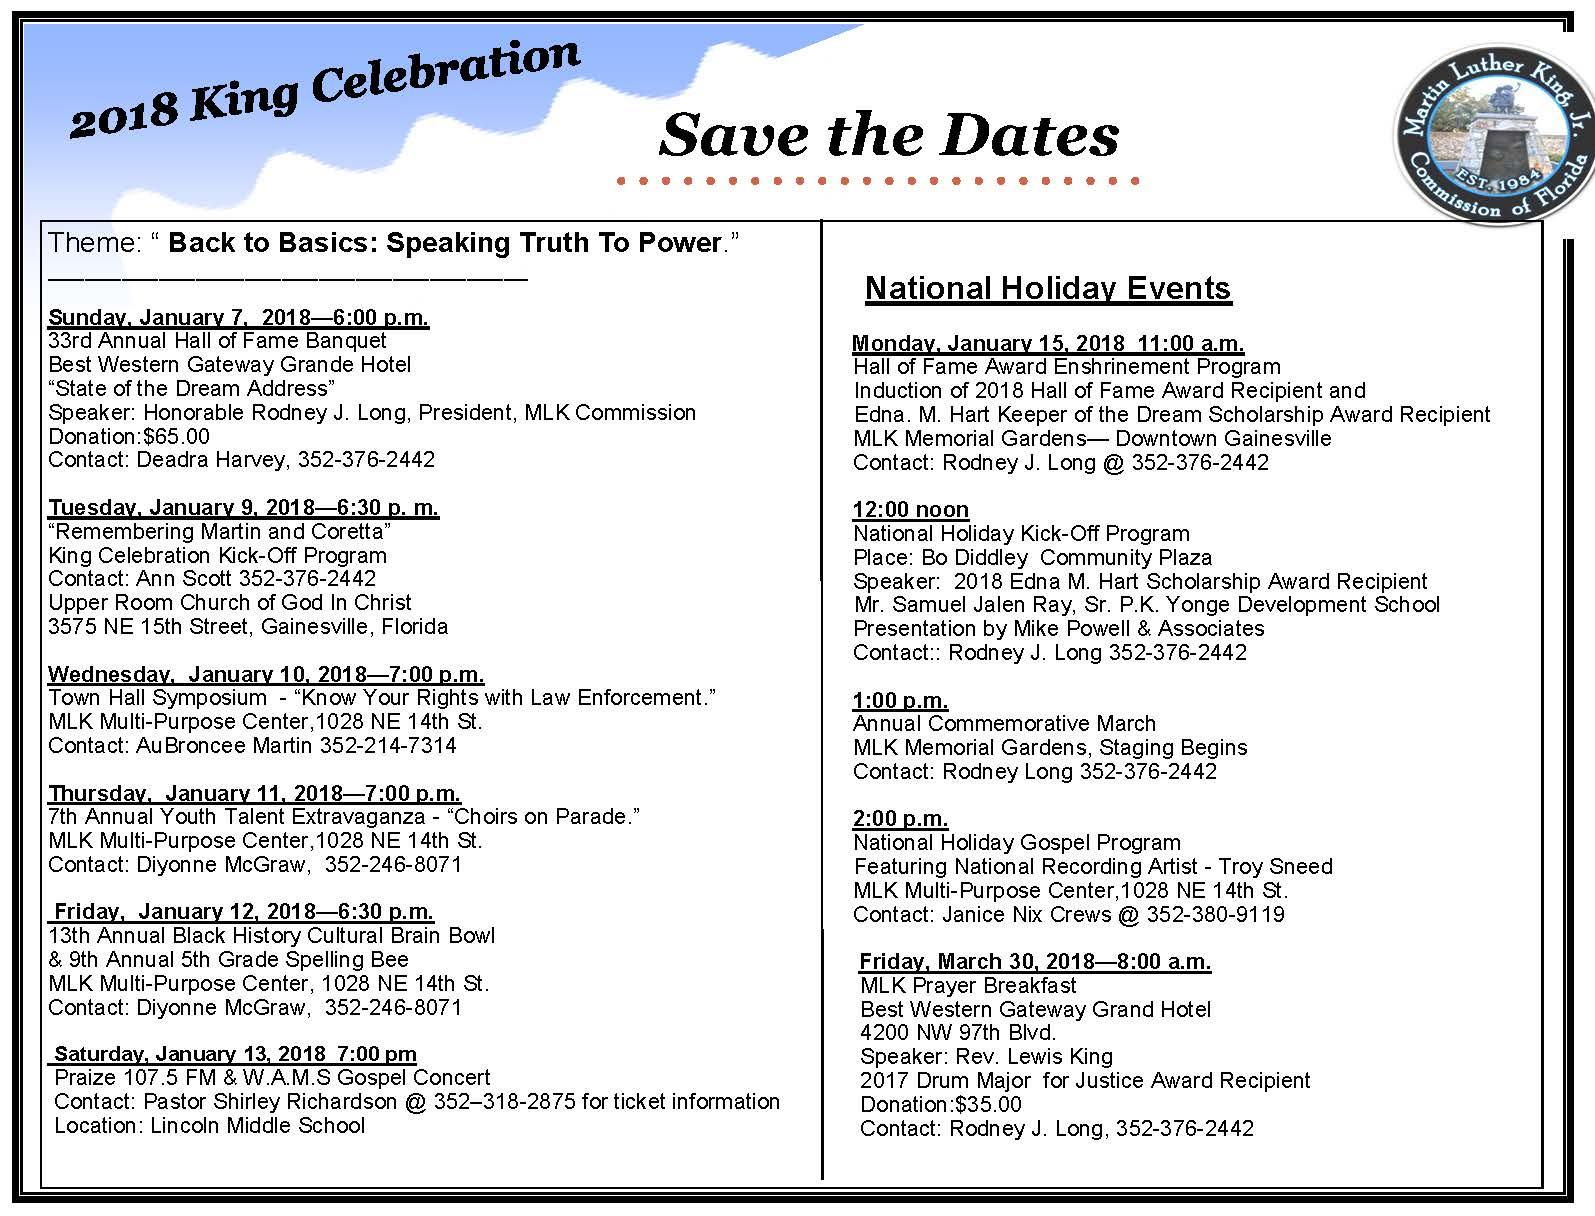 King Celebration Save The Dates Calendar. 2018.jpg